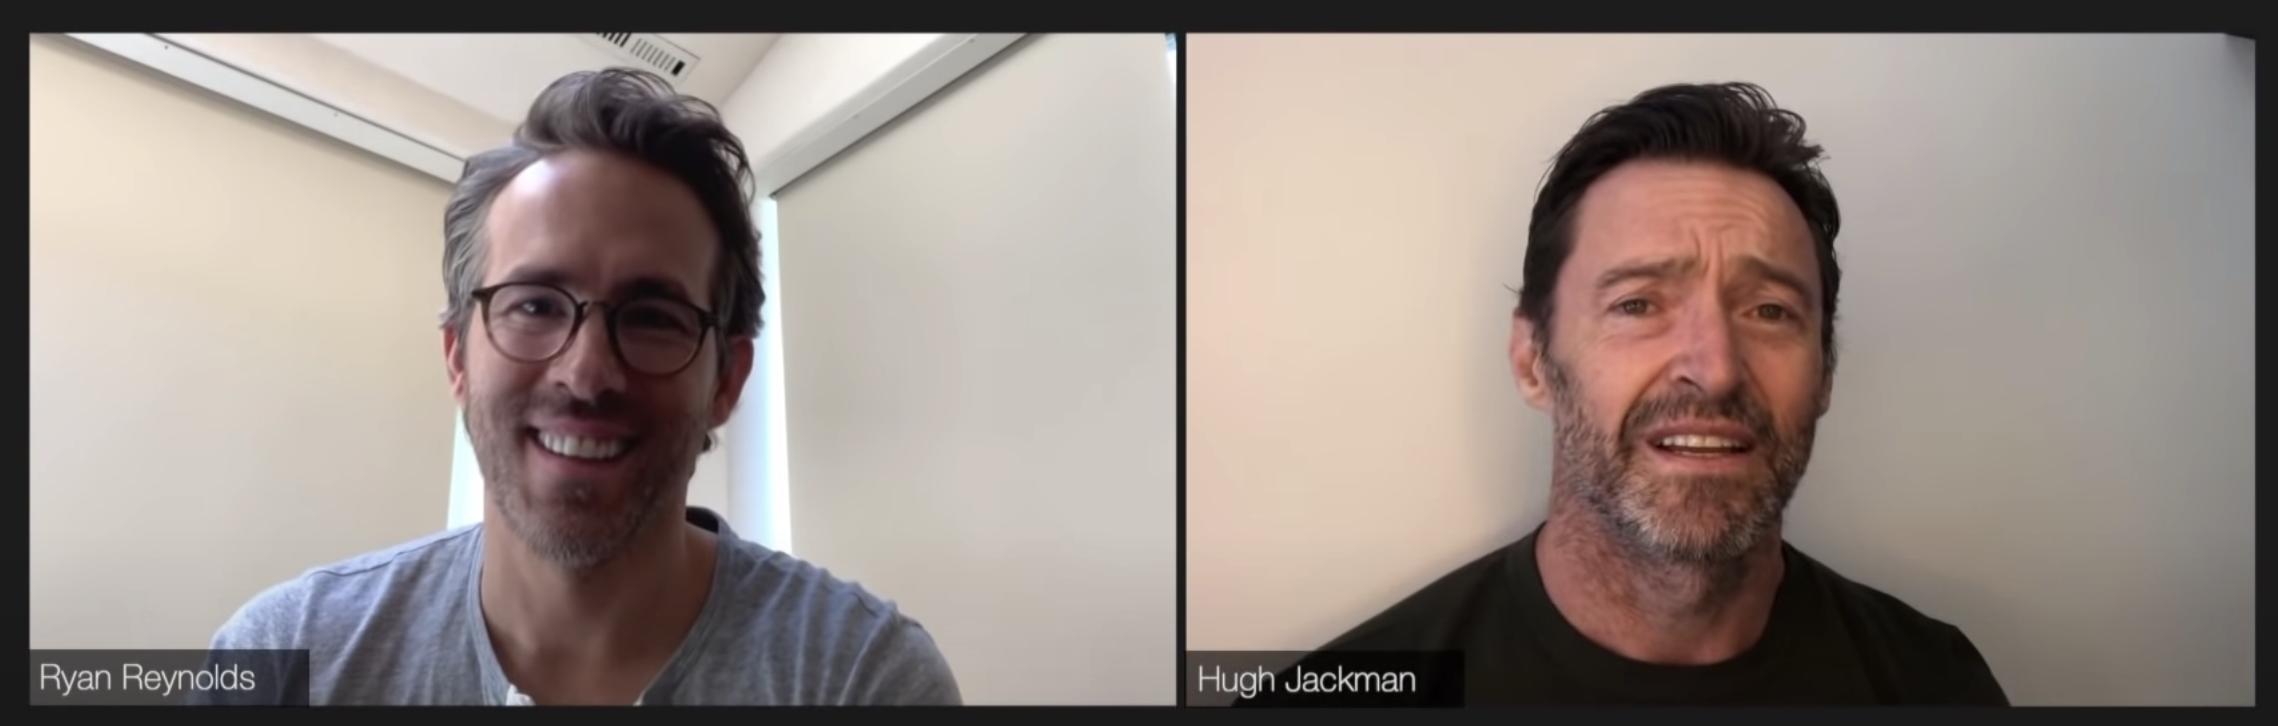 Left: Ryan Reynolds looking happy. Right: Hugh Jackman looking upset.